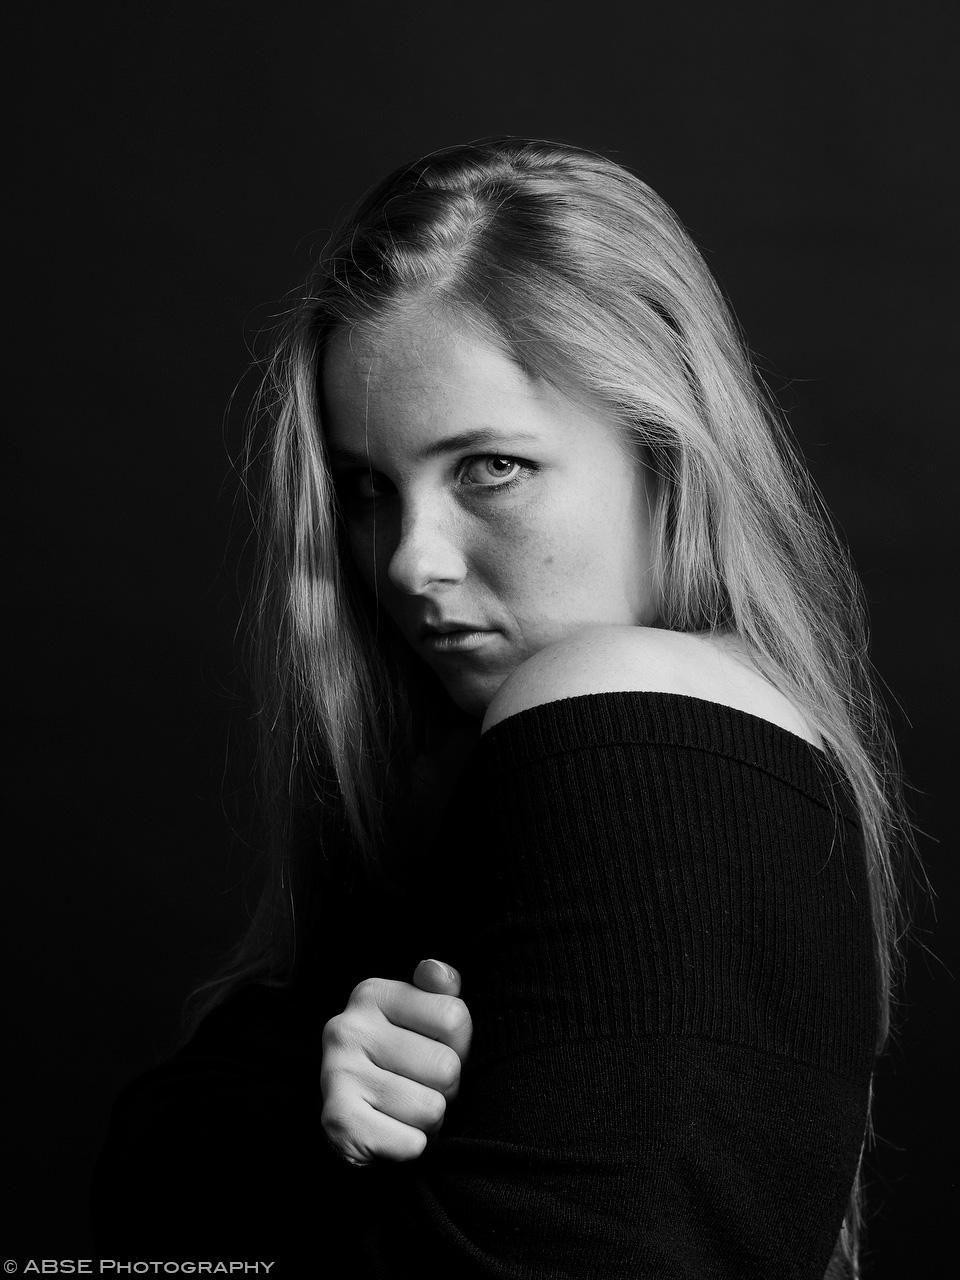 IMAGE: http://blog.absephotography.com/wp-content/uploads/2017/10/aurora-nordica-portrait-studio-black-and-white-hug-final.jpg